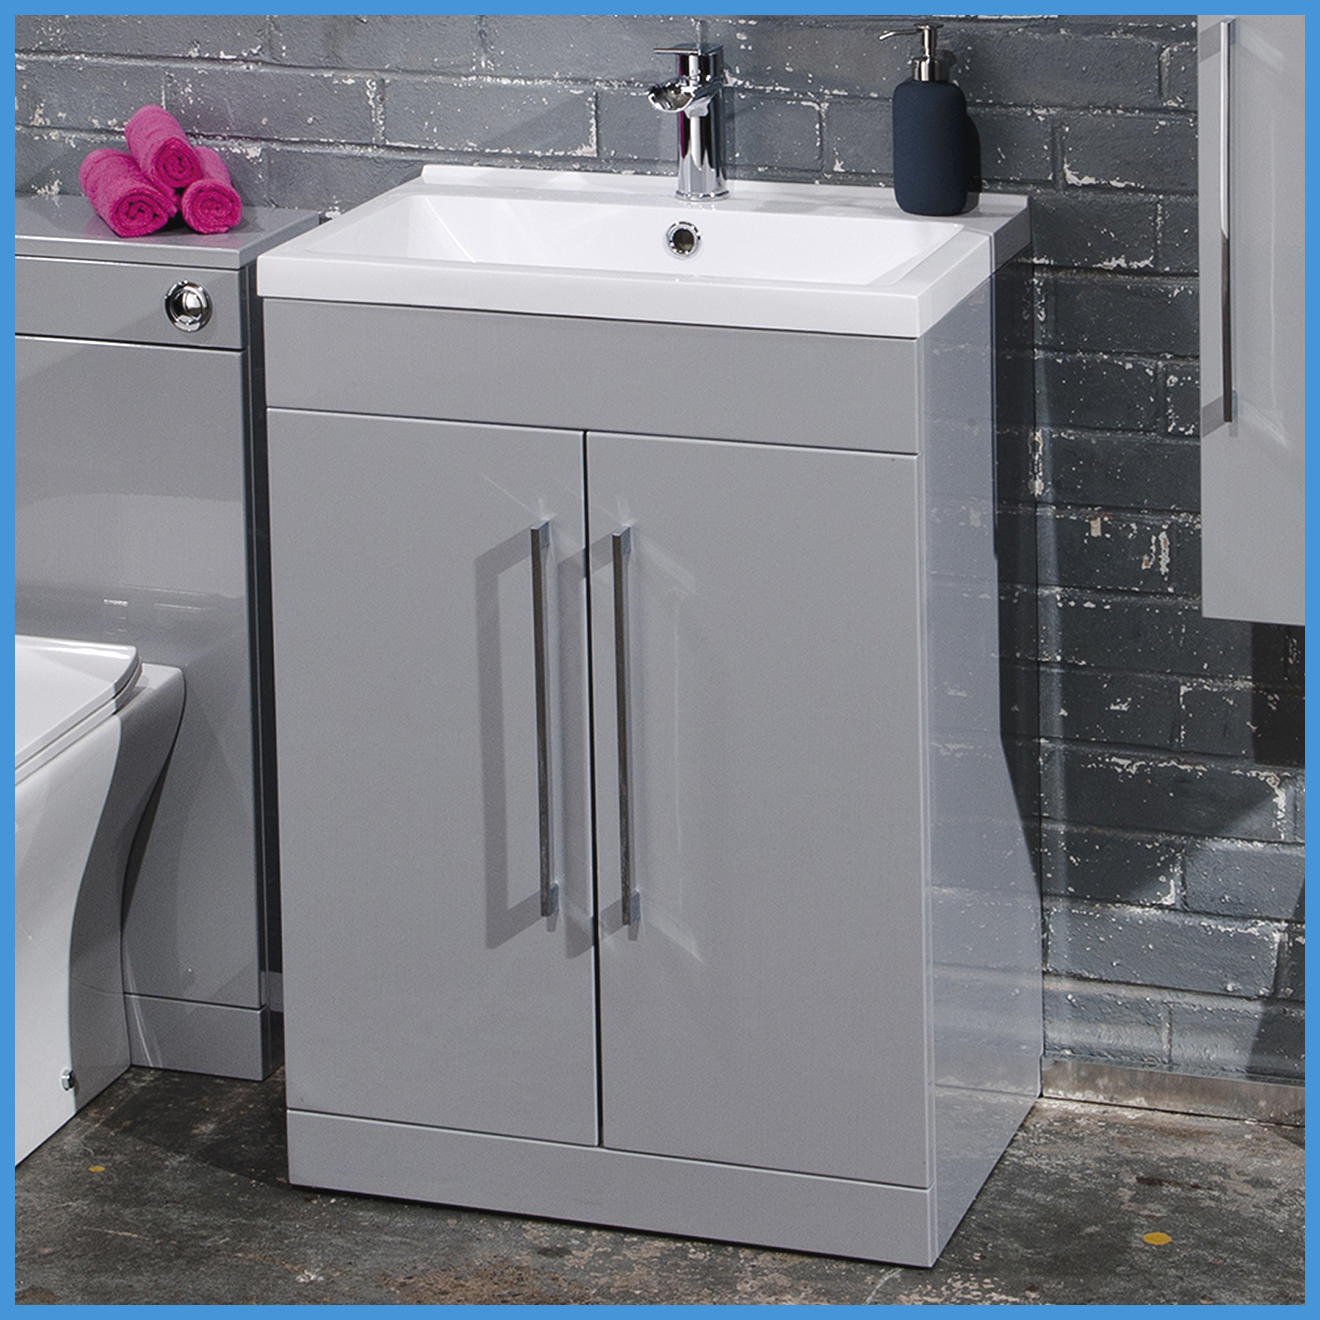 promo code c9f47 98d57 Details about 500mm Modern Grey Vanity Unit Bathroom Furniture Cabinet  Basin Bathroom Storage